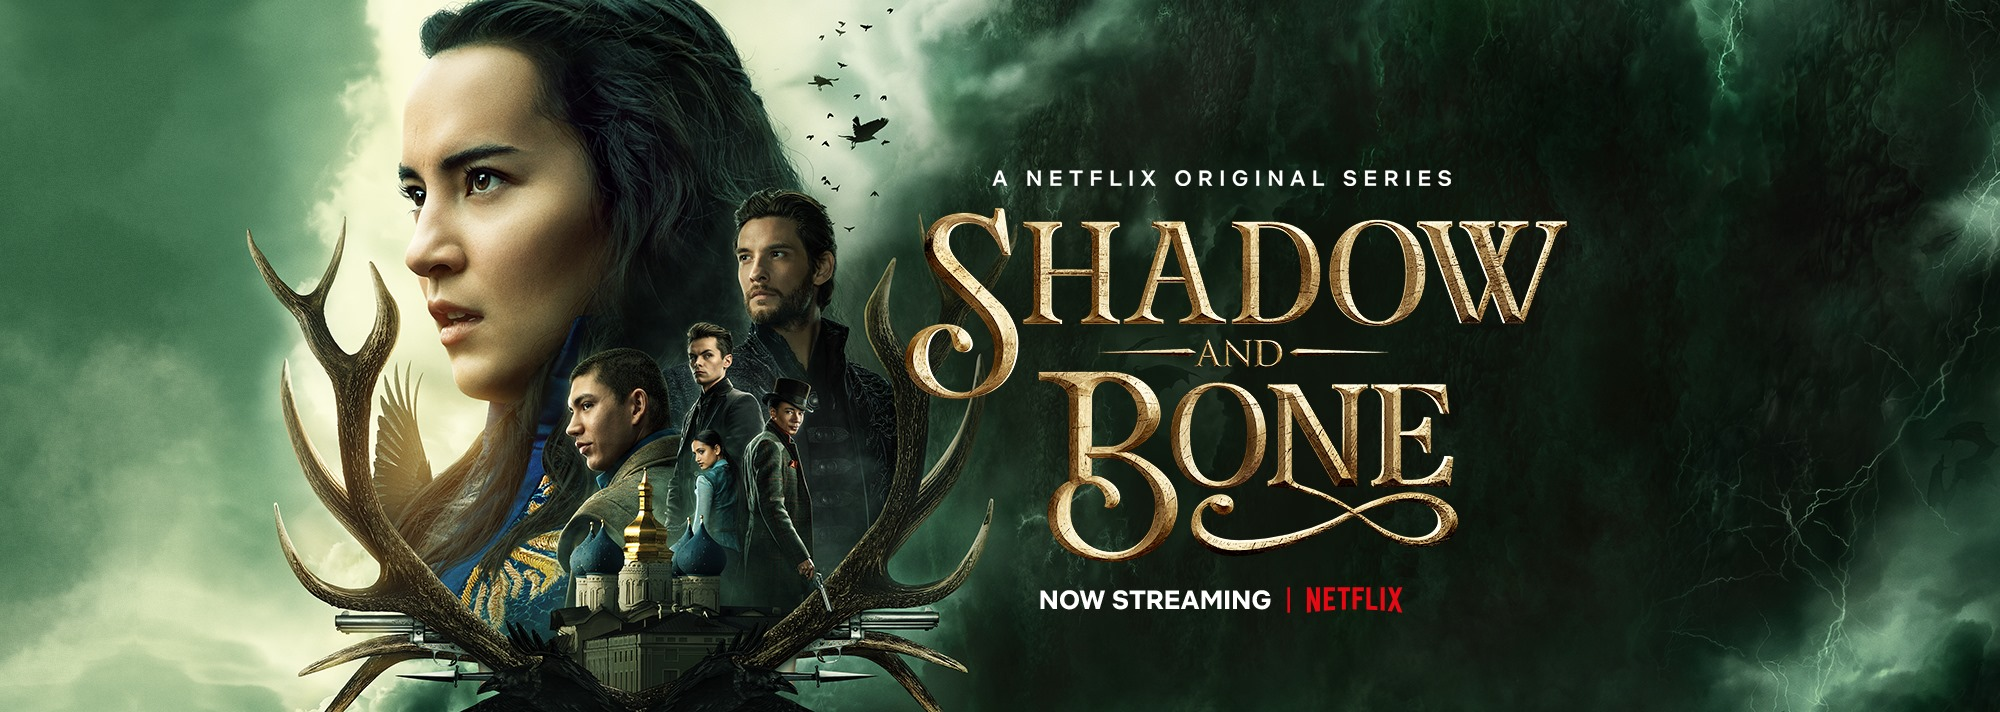 Shadow and Bone, Netflix, 21 Laps Entertainment